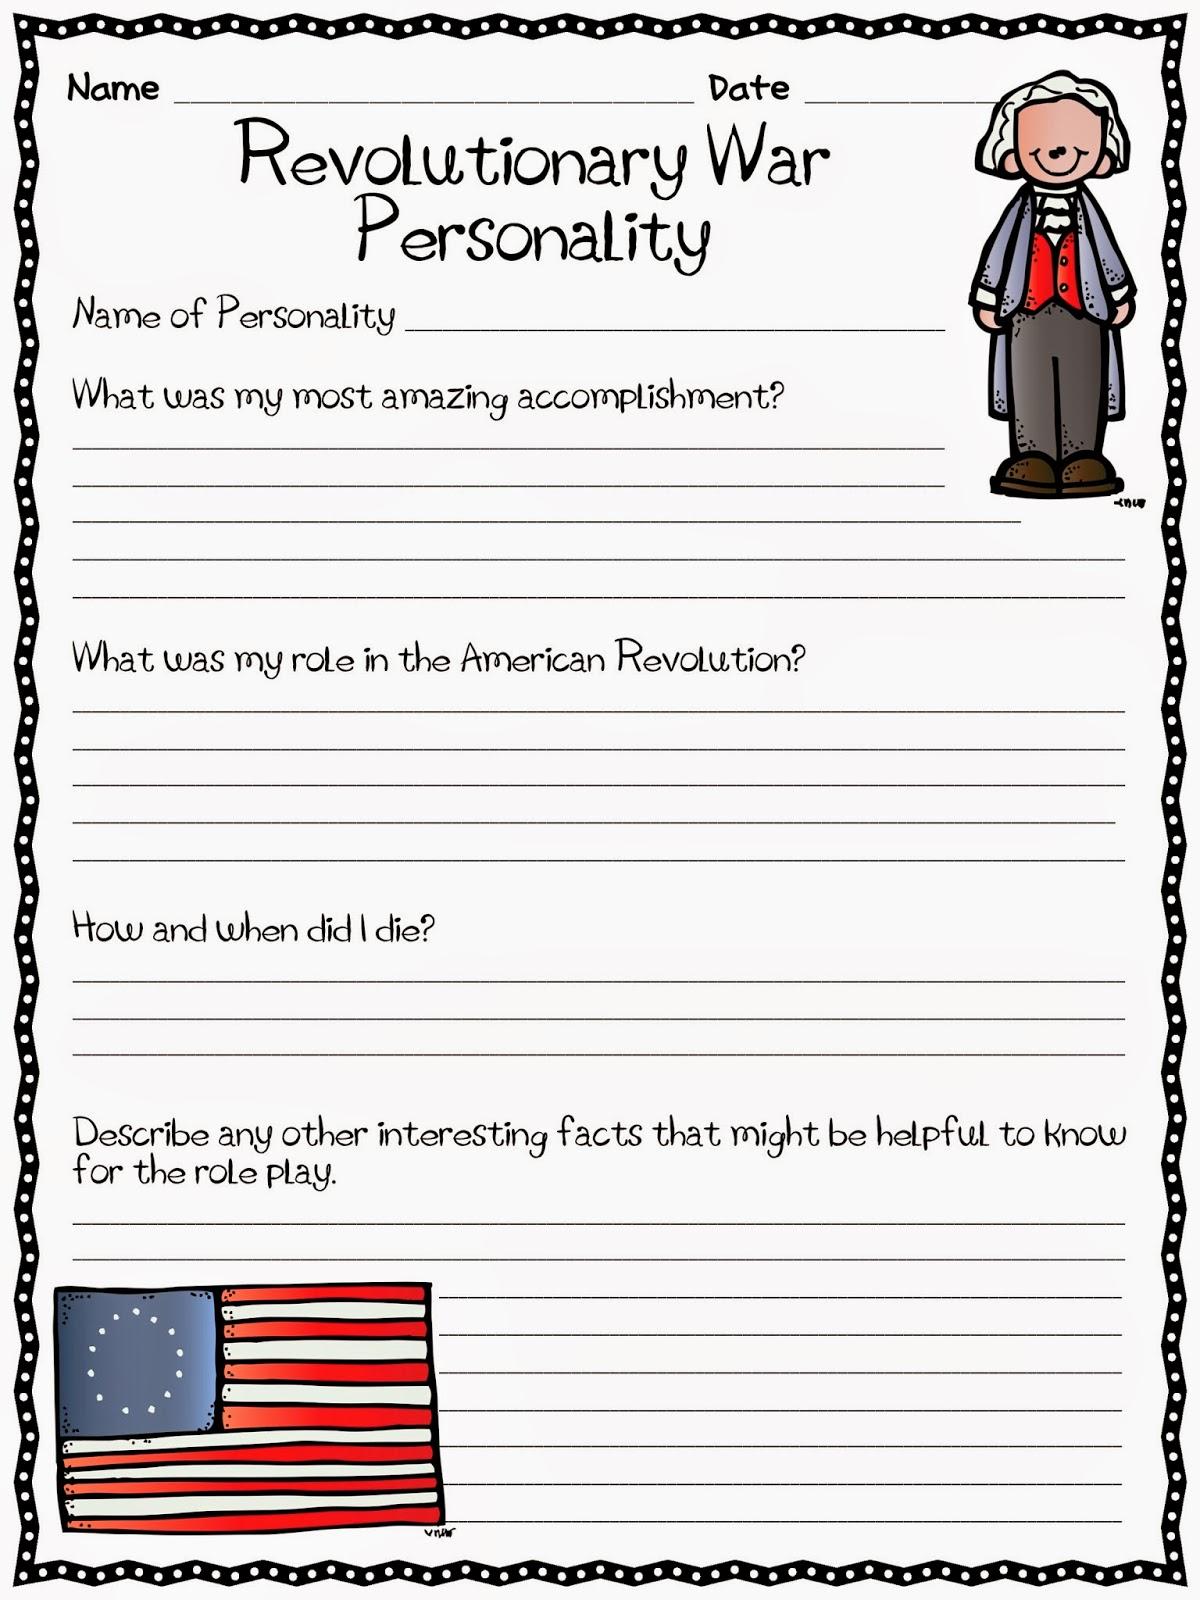 medium resolution of American Revolutionary War Timeline Worksheet   Printable Worksheets and  Activities for Teachers